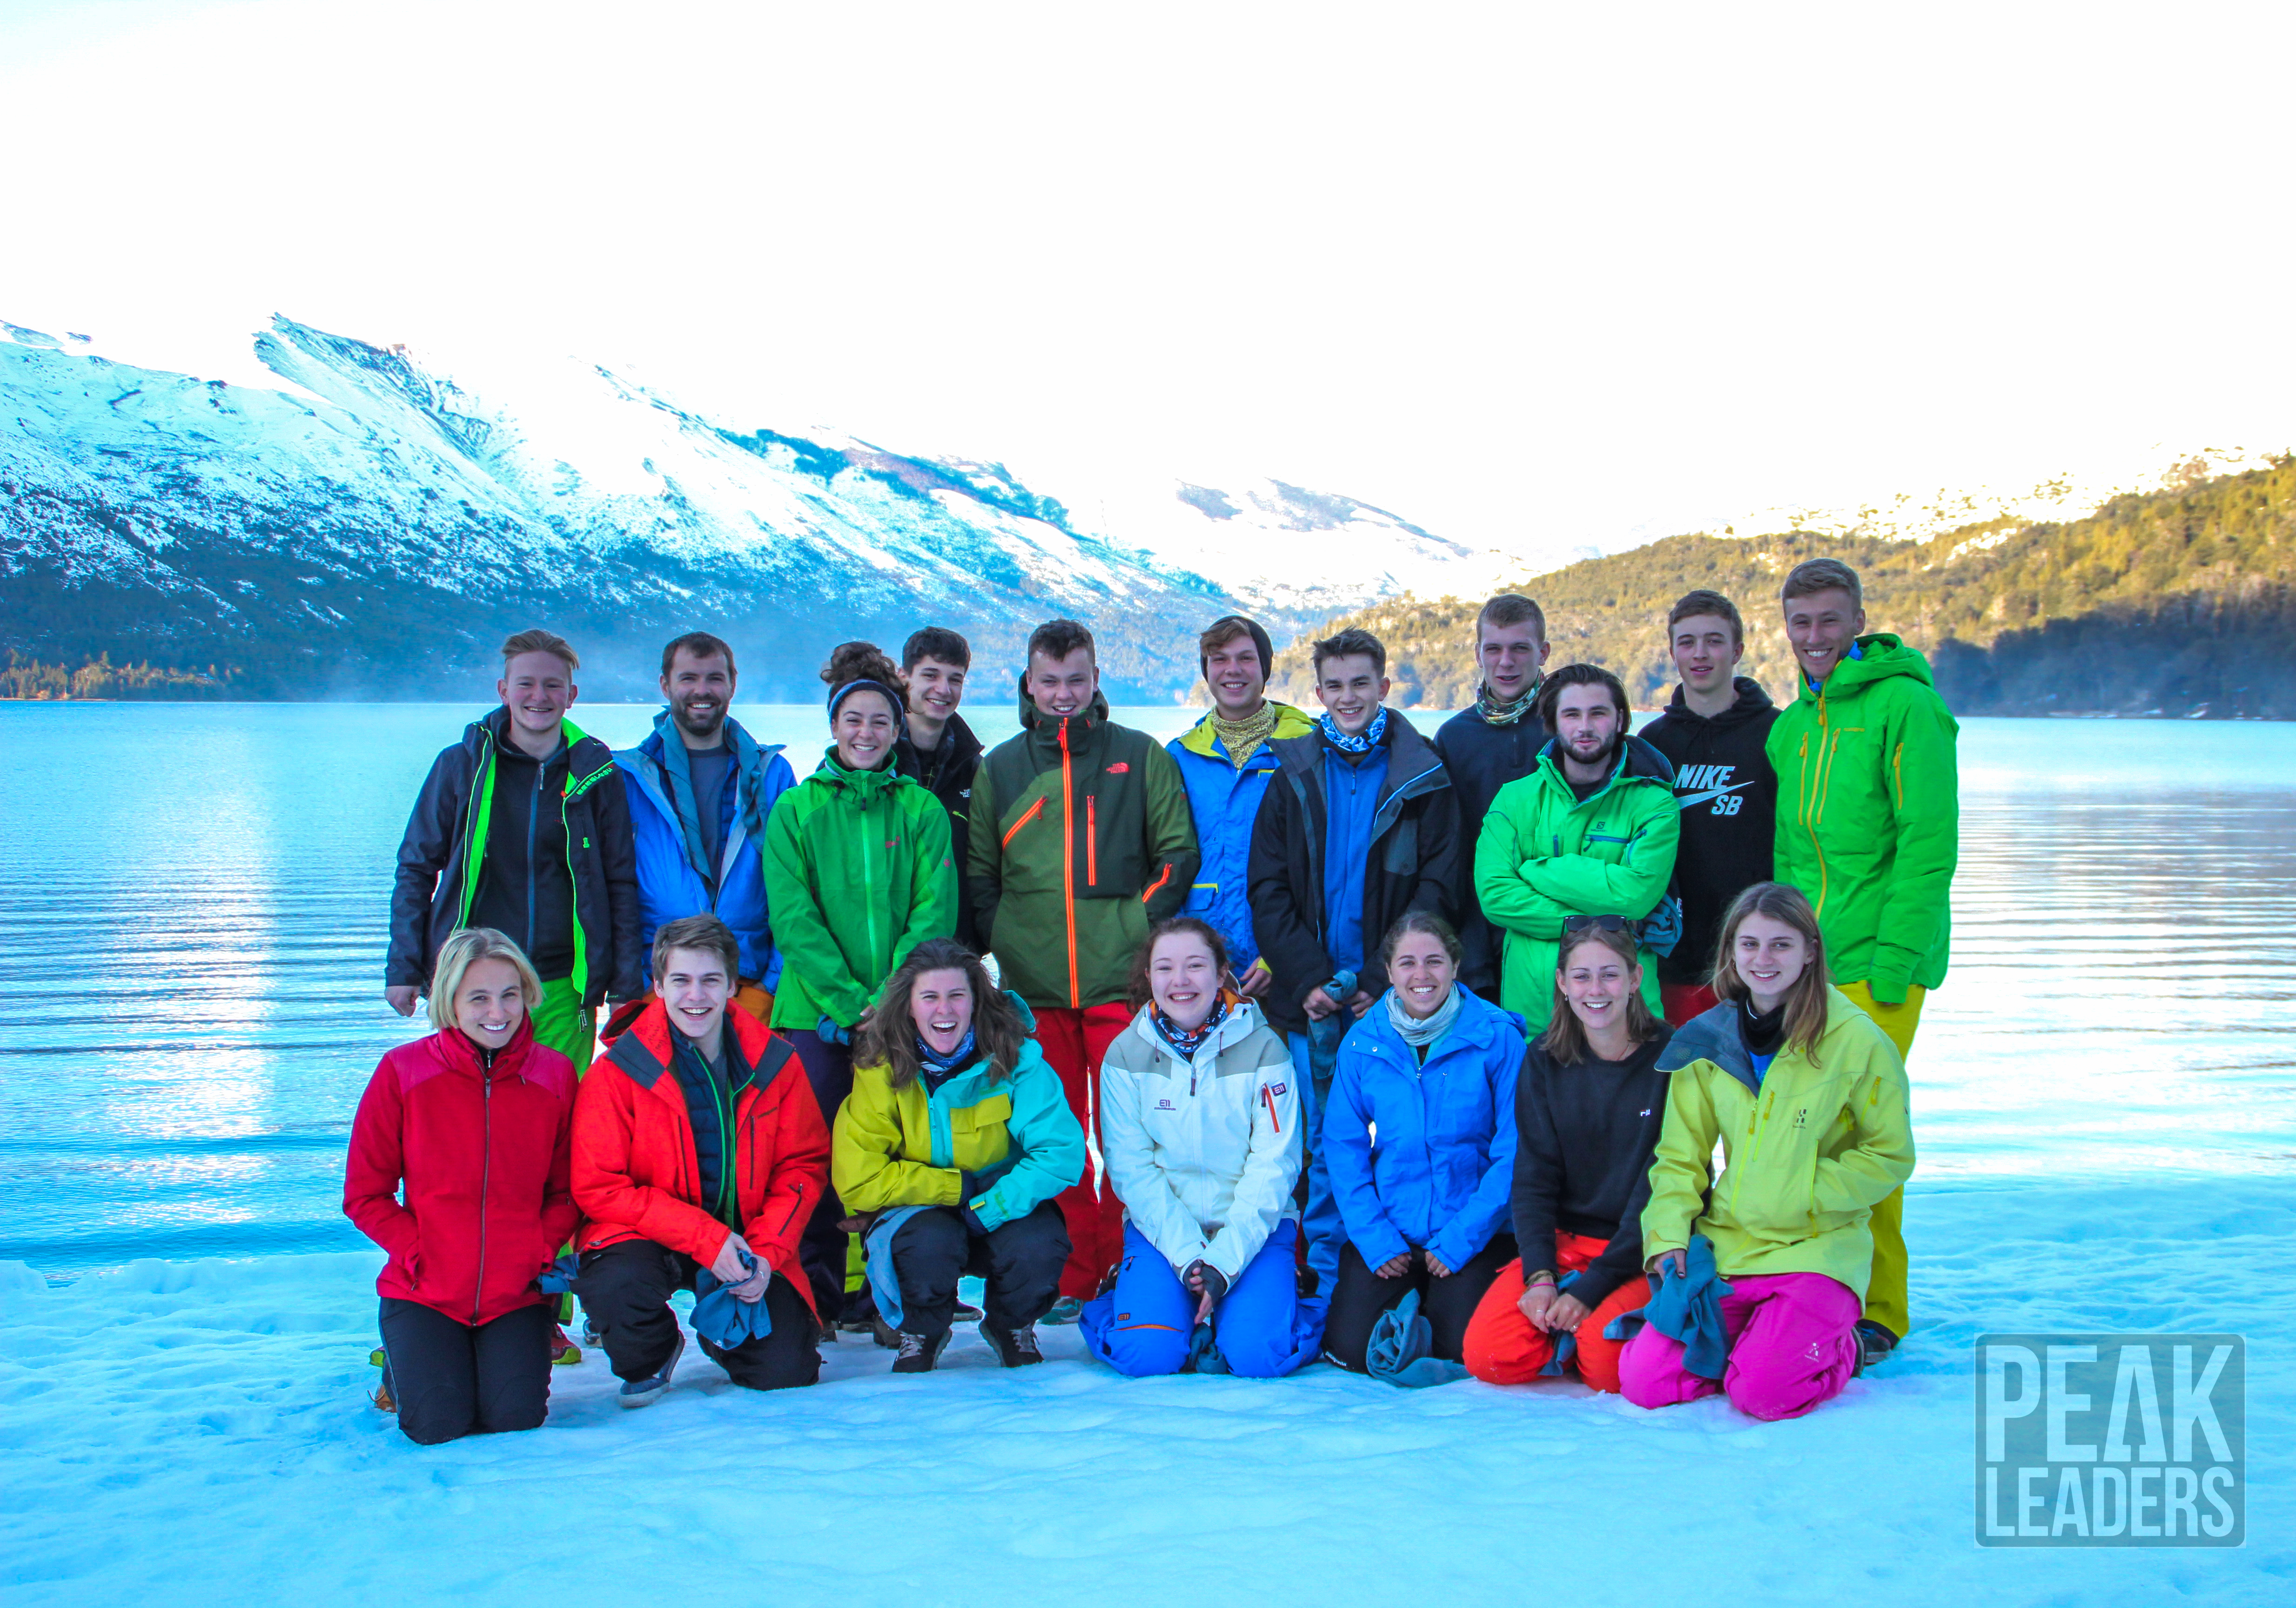 2015 Ski Instructor Graduate group photo